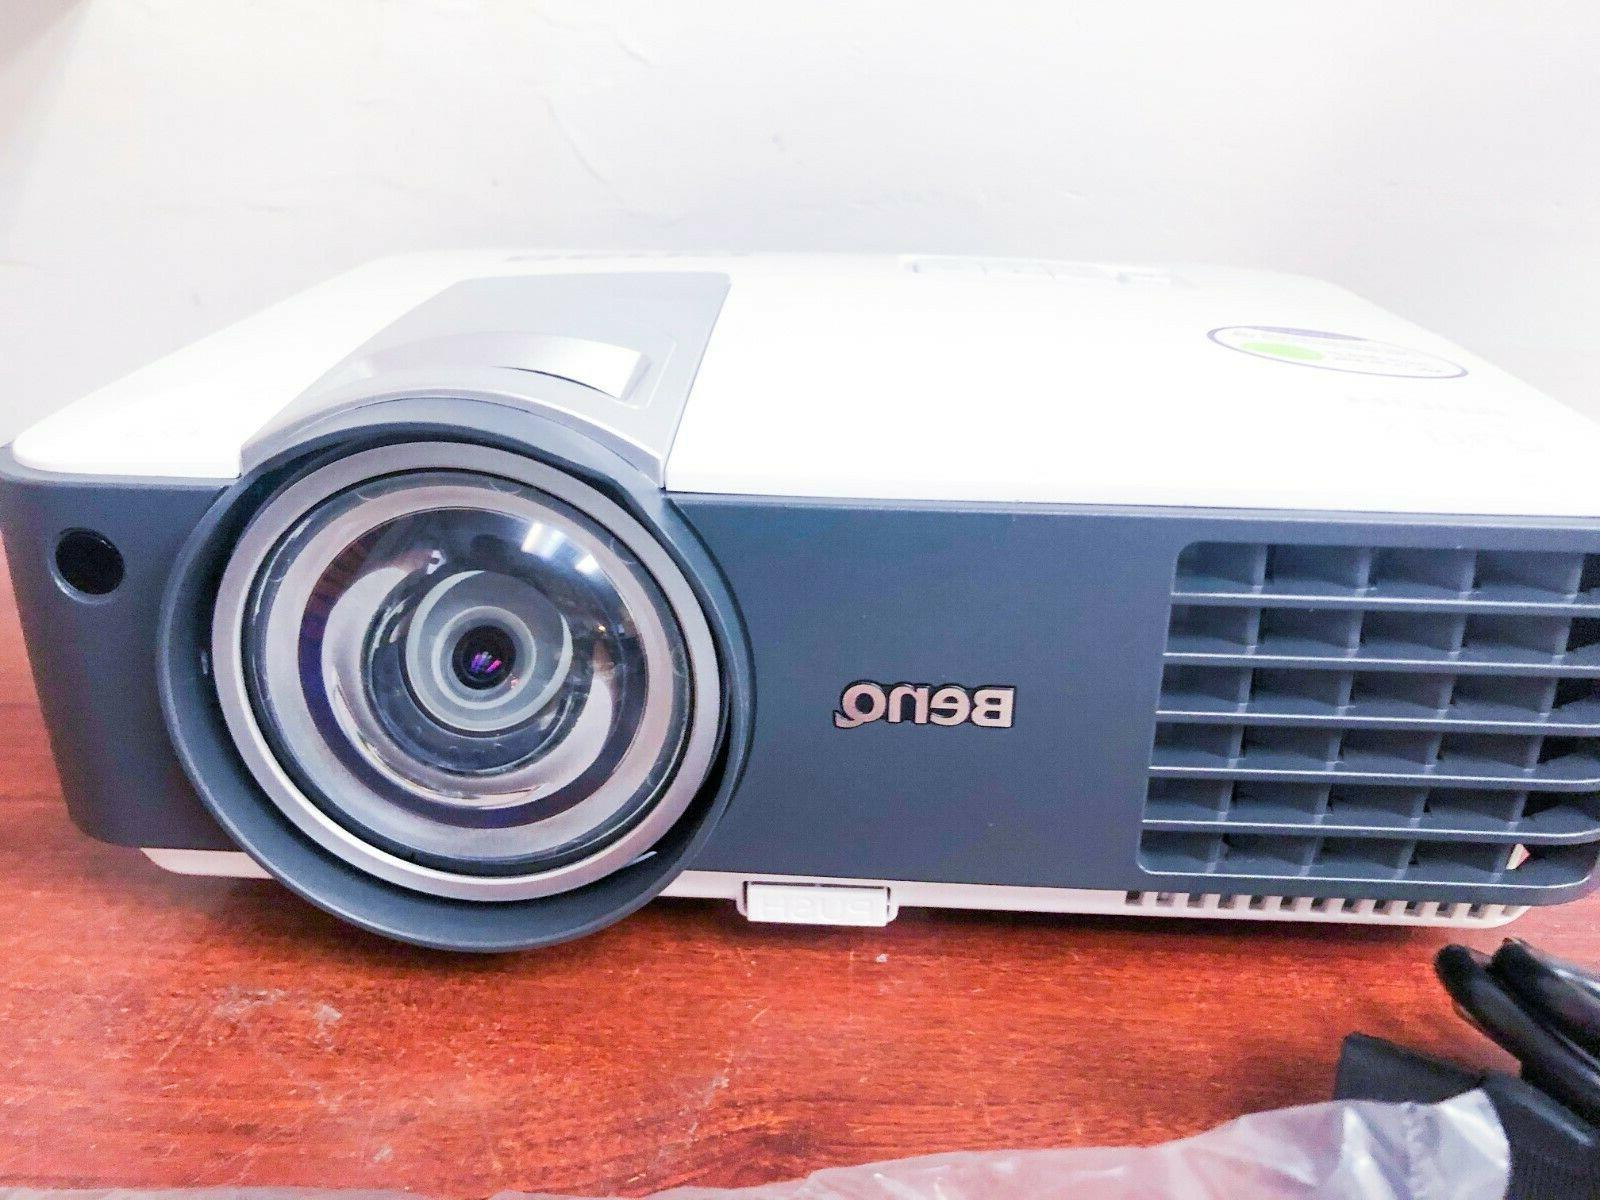 BenQ MX819ST 1080p/60 HDMI ceiling 3000 w/remote